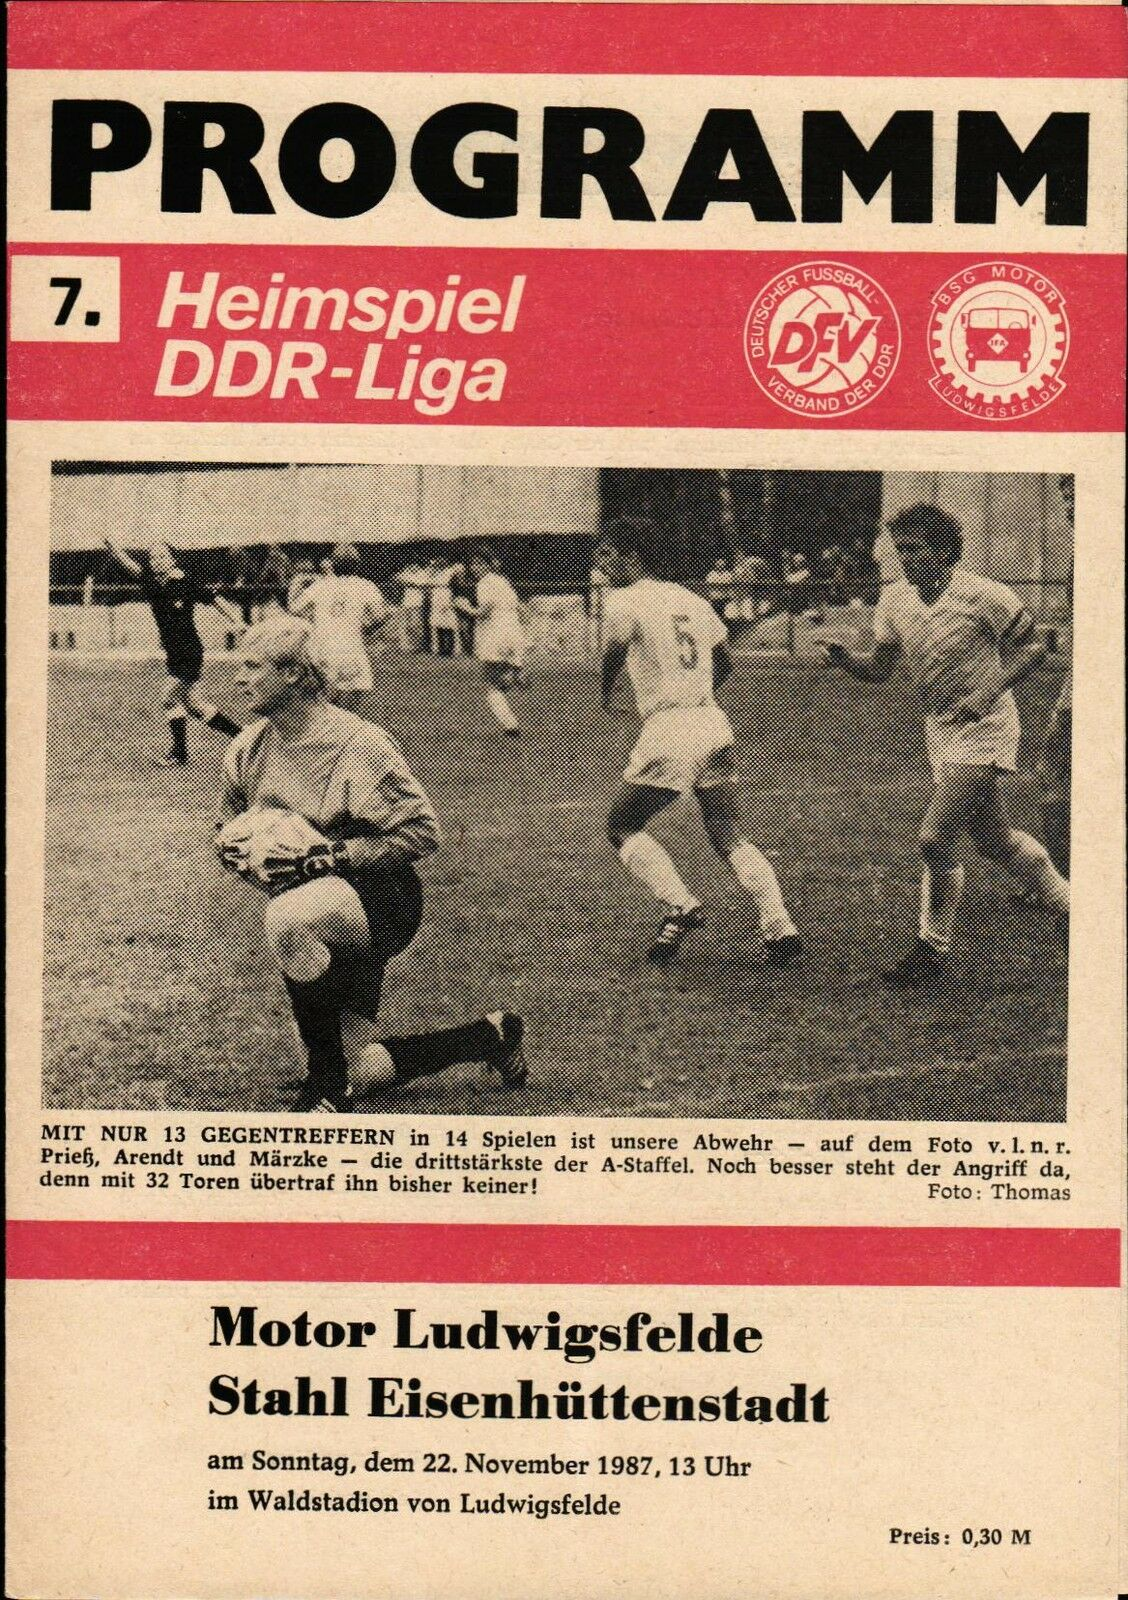 DDR-Liga 87/88 BSG Moteur Moteur Moteur Windsor - Acier Eisenhüttenstadt, 22.11.1987 1a4e72